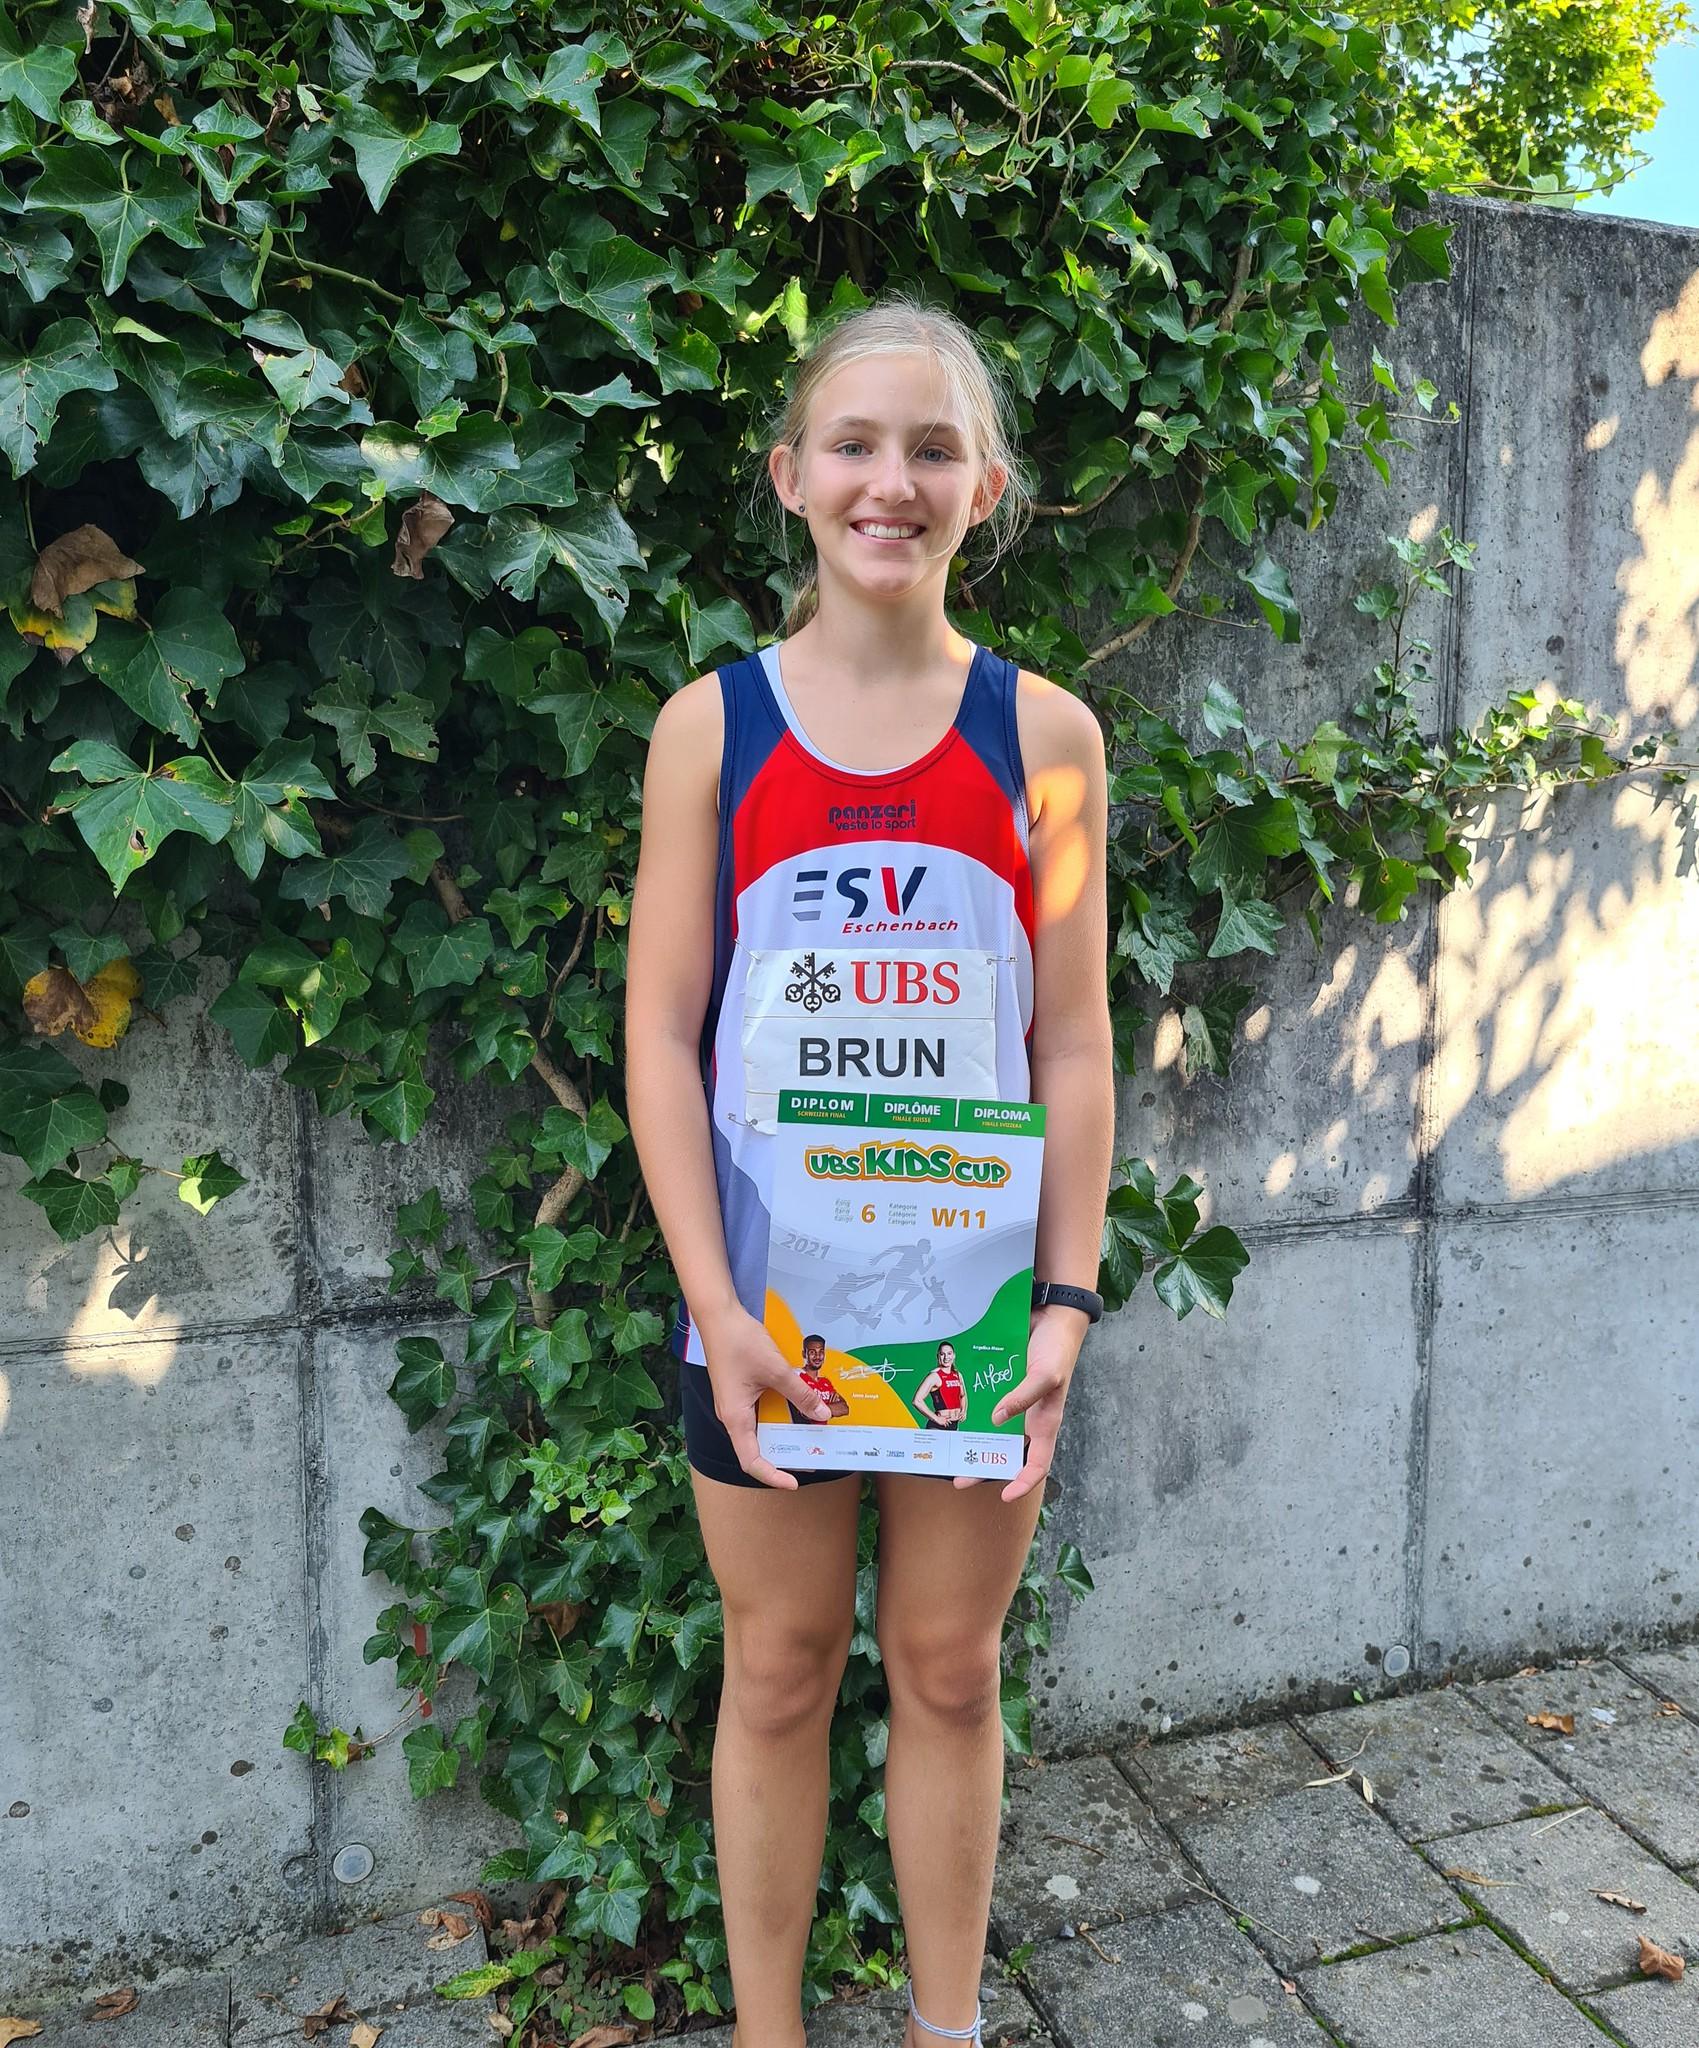 UBS Kids Cup ESV Bild1 Lena Brun